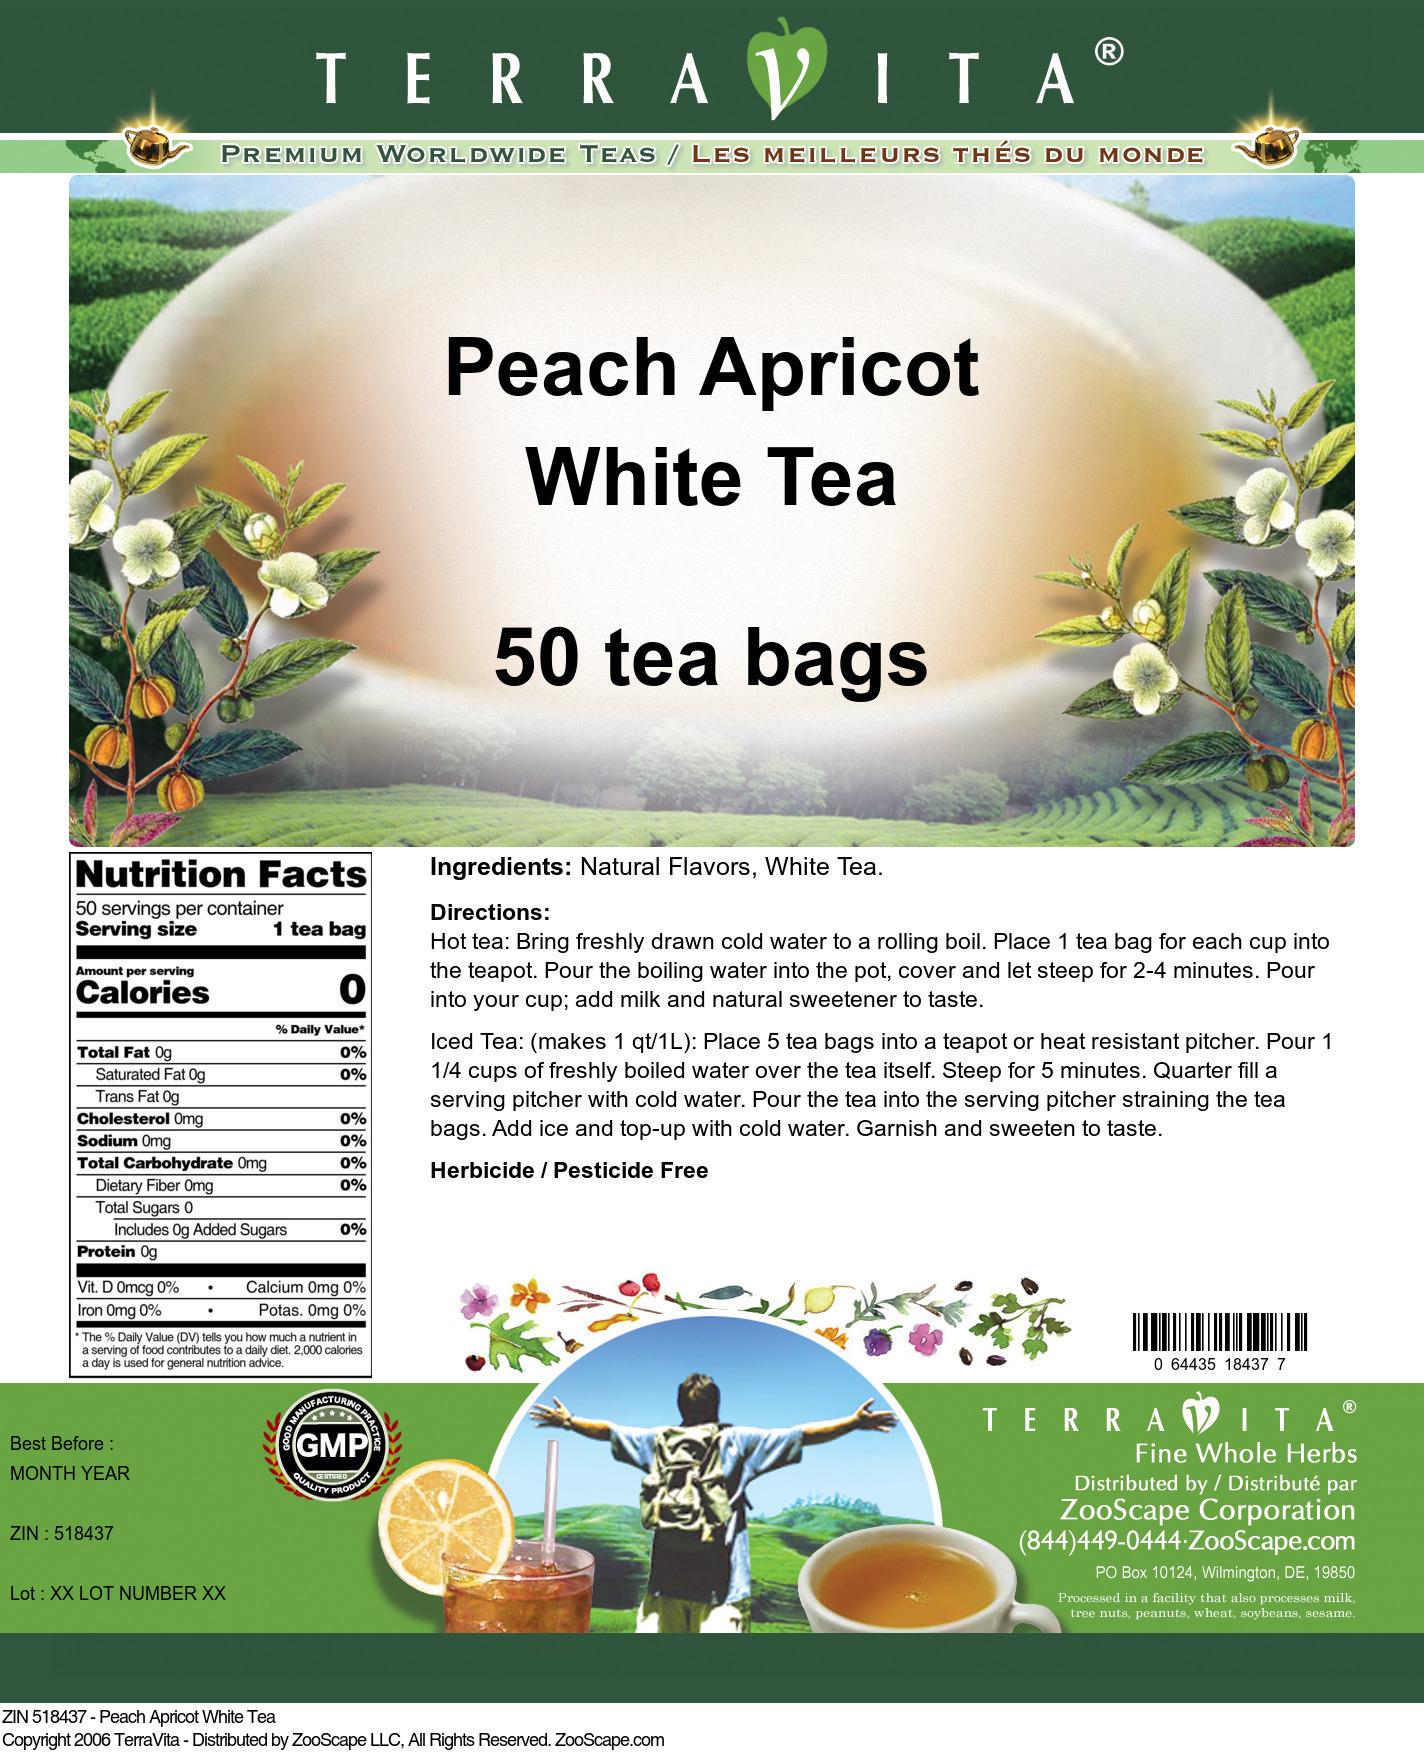 Peach Apricot White Tea